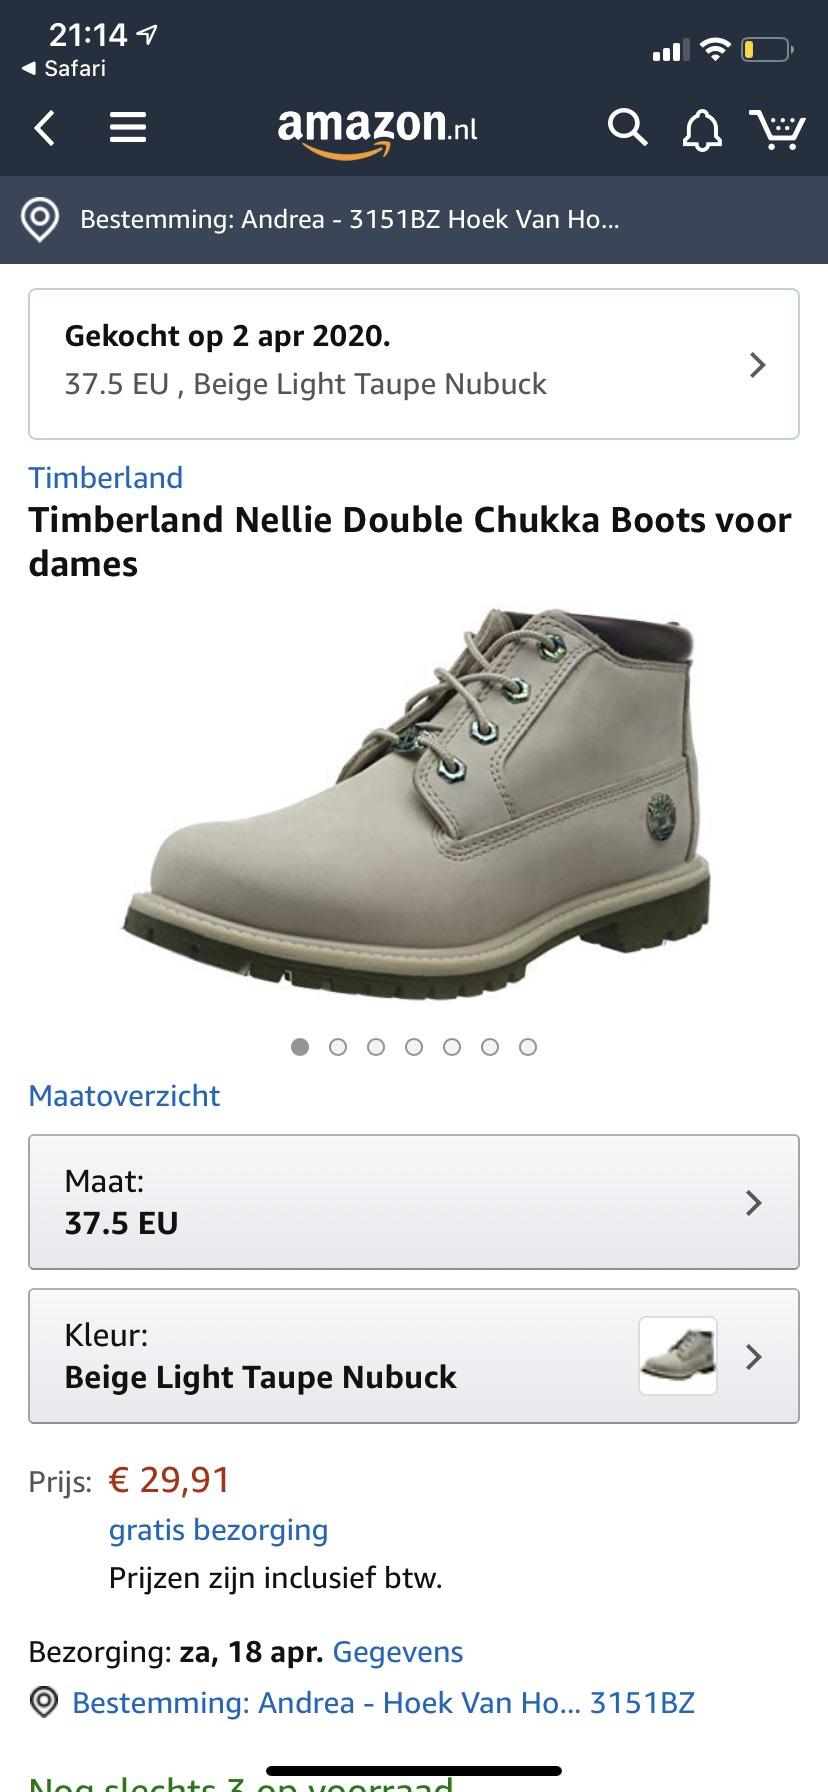 Timberland Nellie Chukka Dames voor €29,91